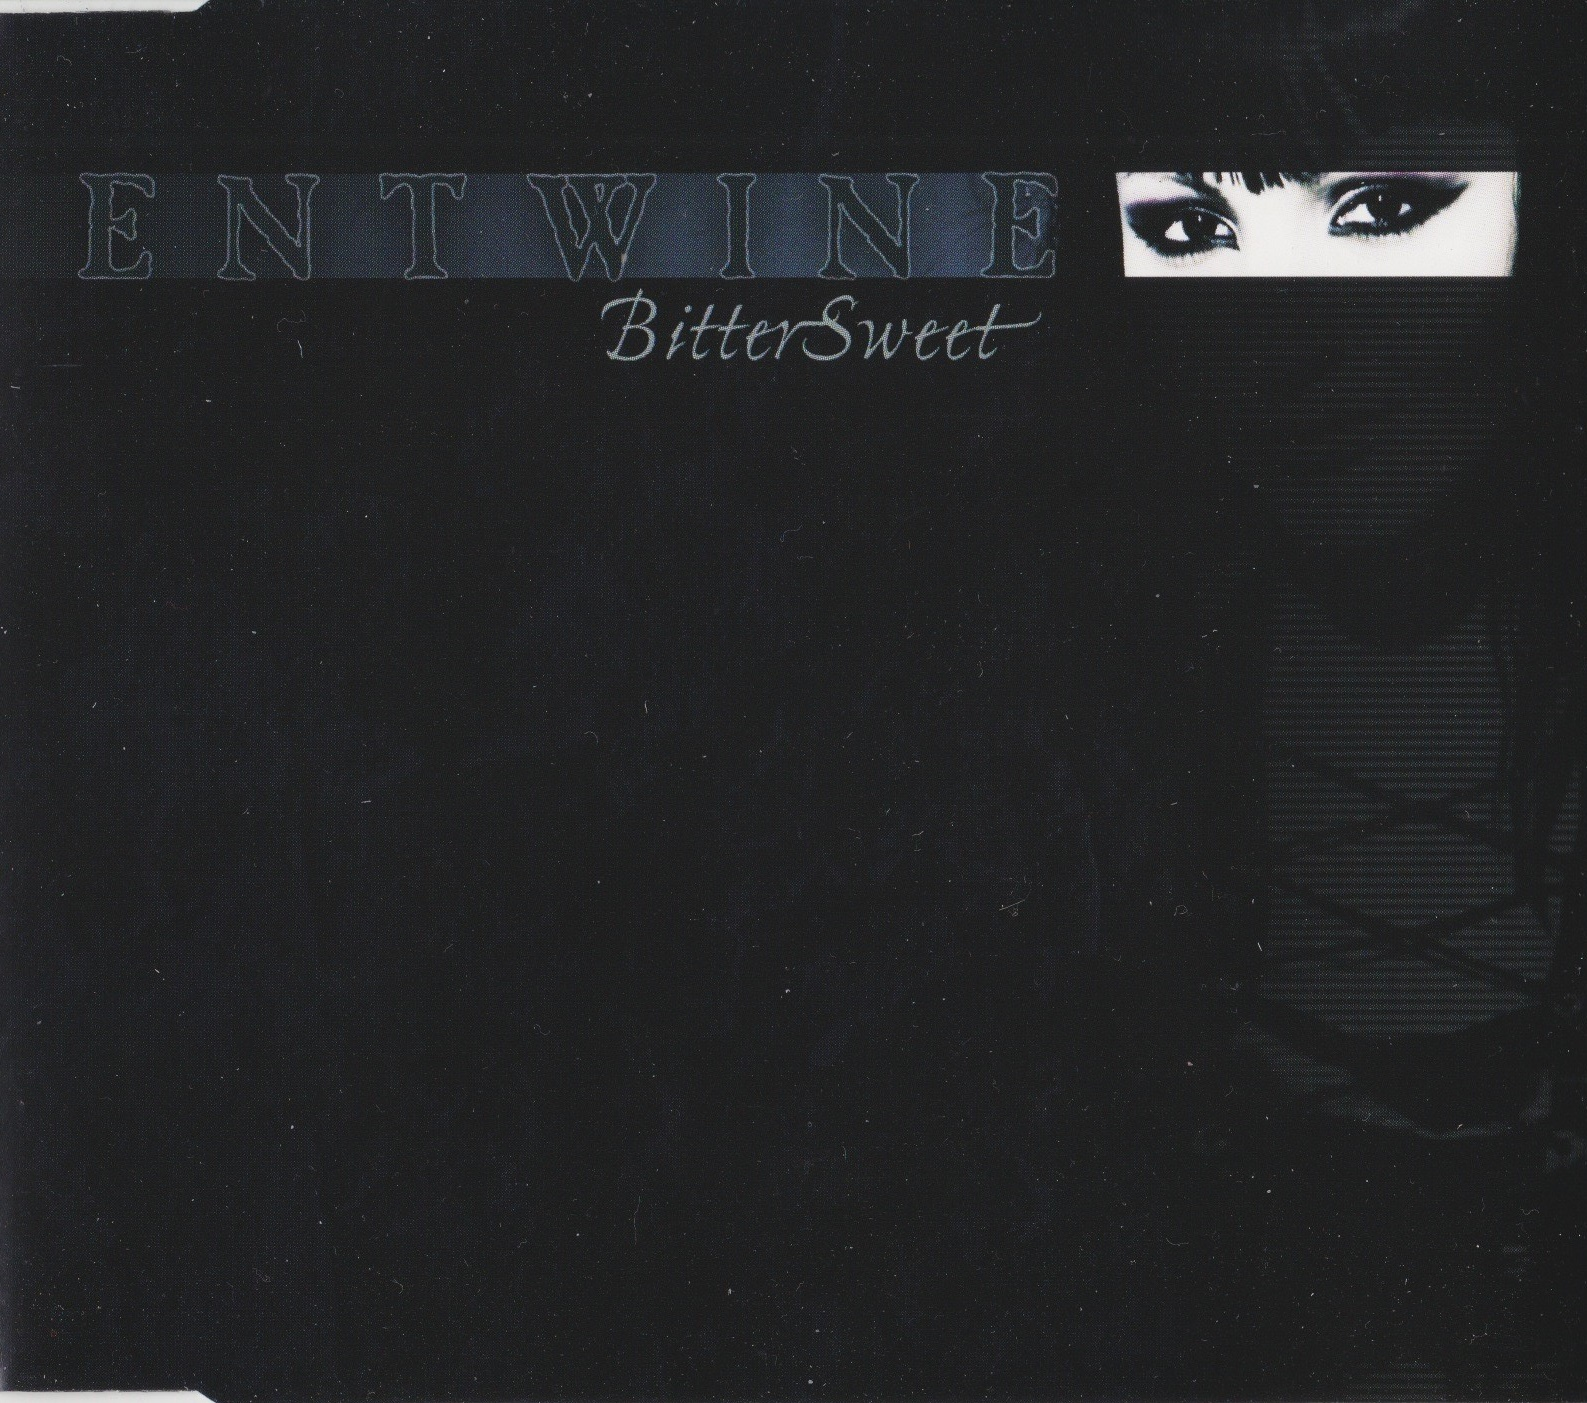 Entwine — Bitter Sweet CDS (2004)